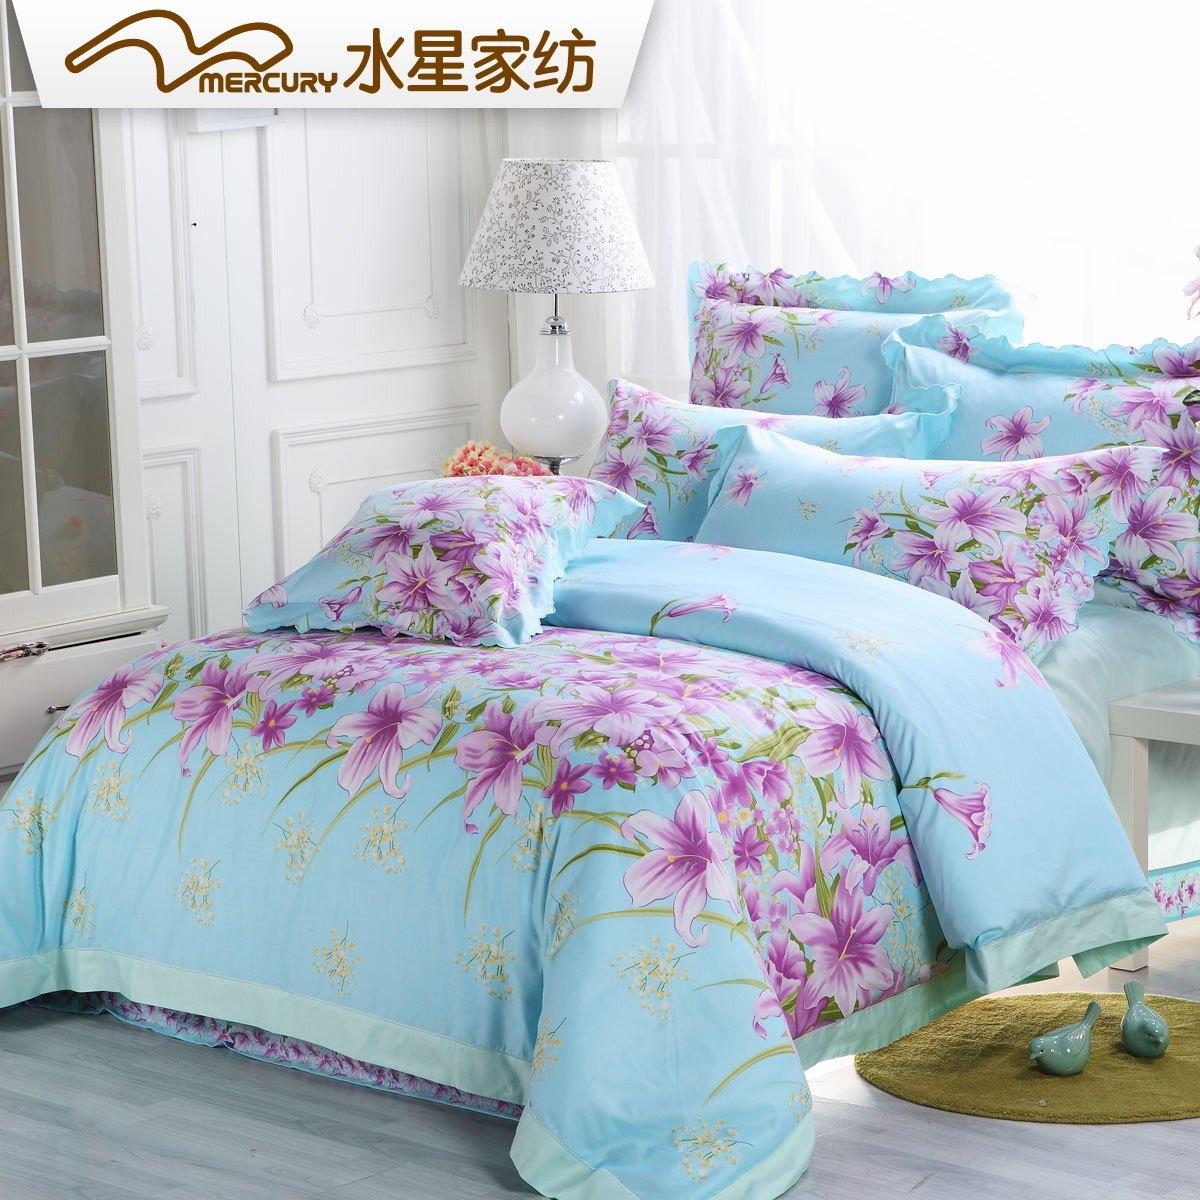 2015 New Real 40 Jogo De Cama Bedding Sets Perfume Lily 100% Cotton Duvet Cover Bedrug Four Piece Set Kit Bed Sheets Bedding(China (Mainland))